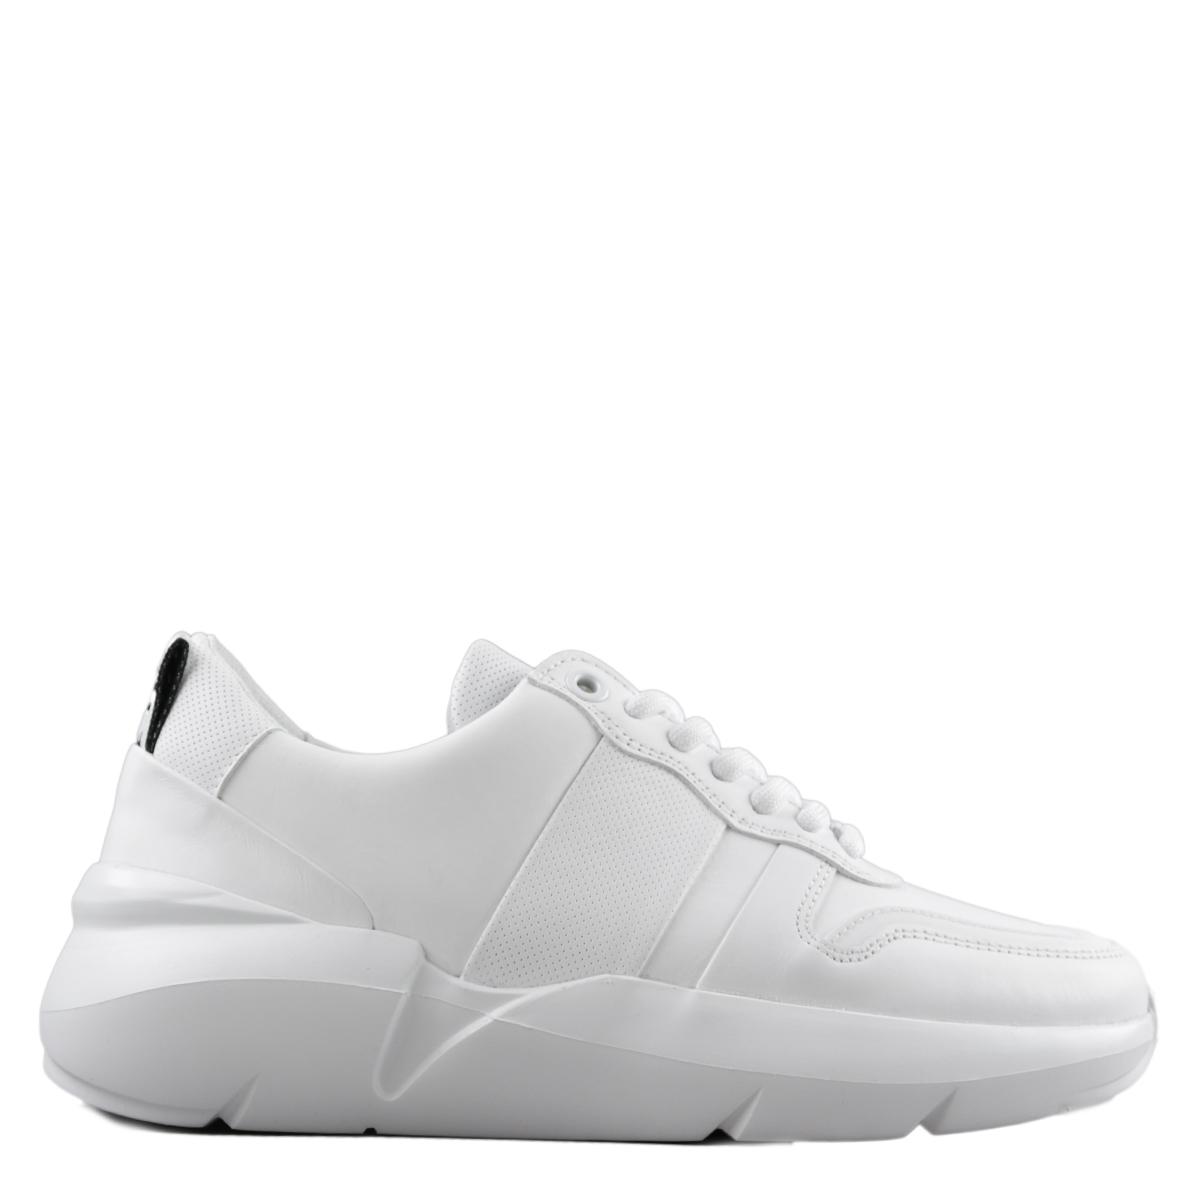 NUBIKK sneakers lucy may